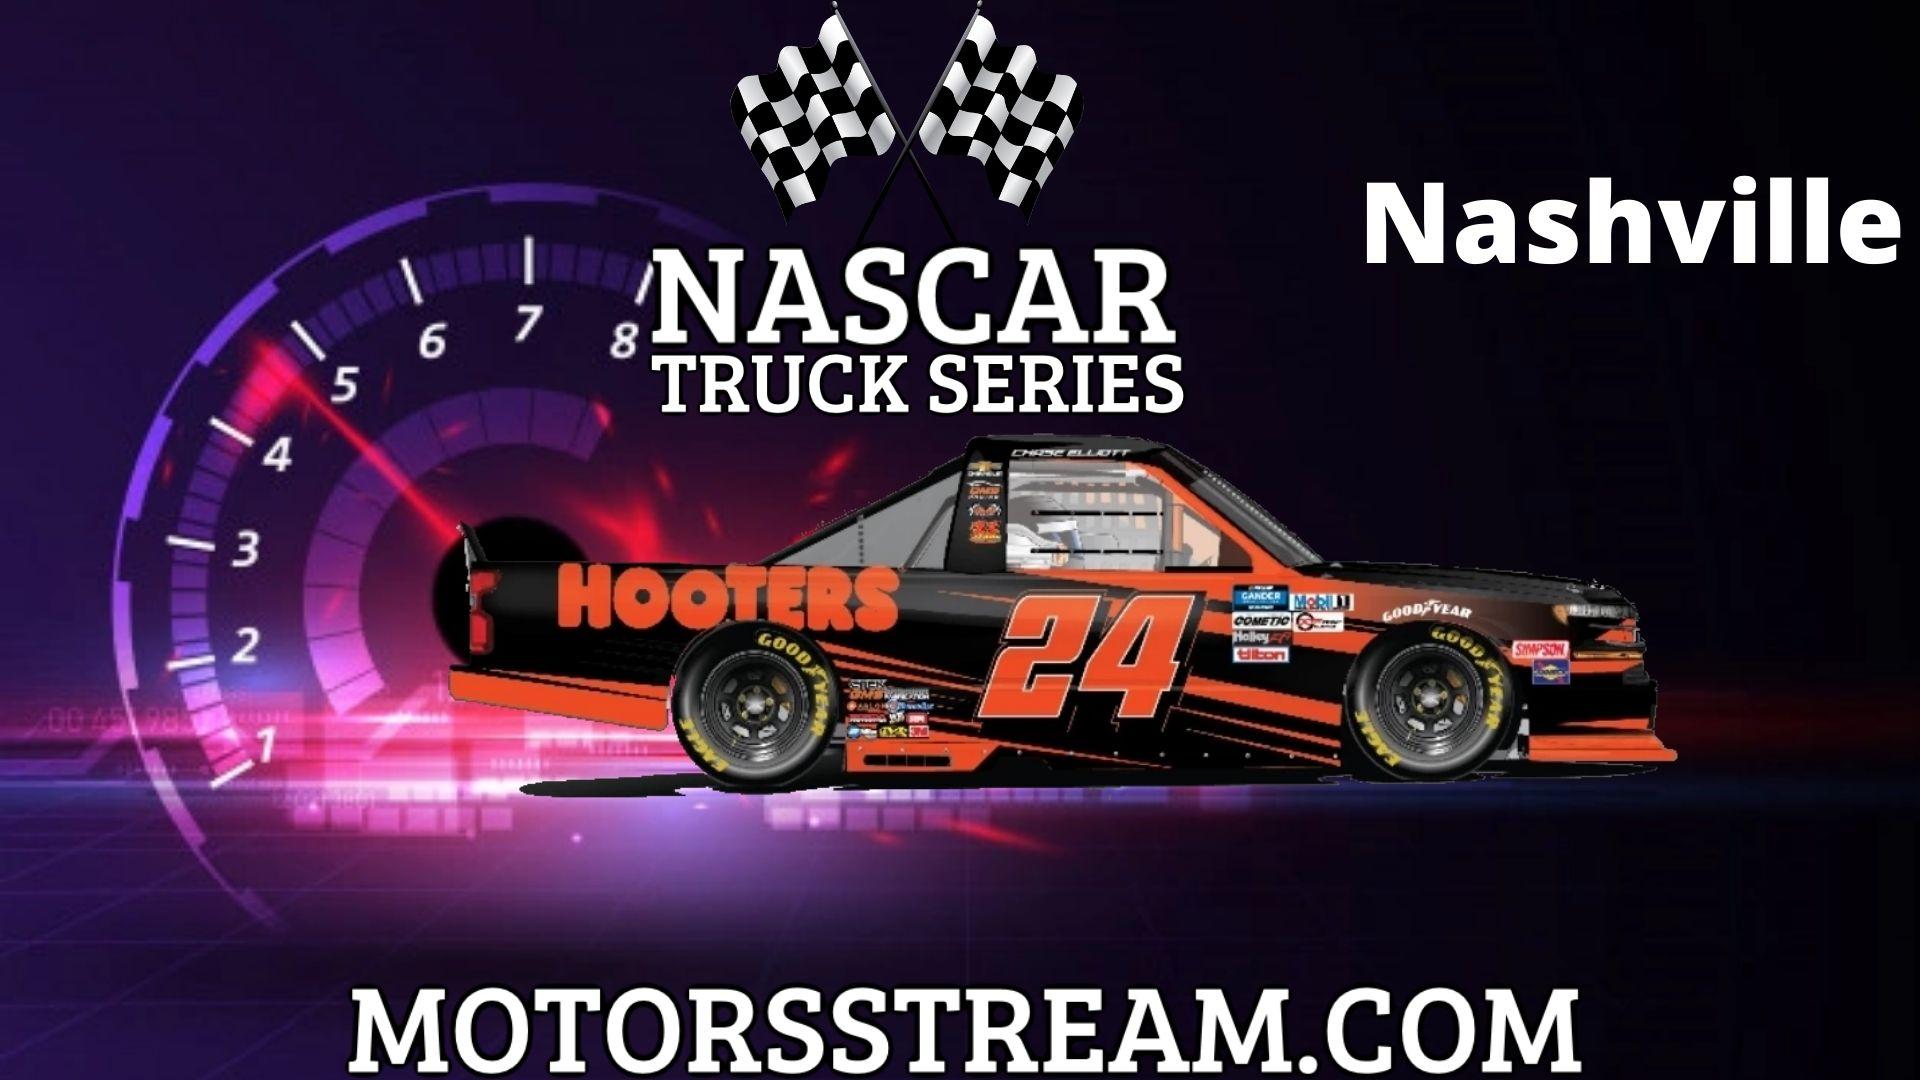 NASCAR Camping World Truck Series at Nashville Live Stream